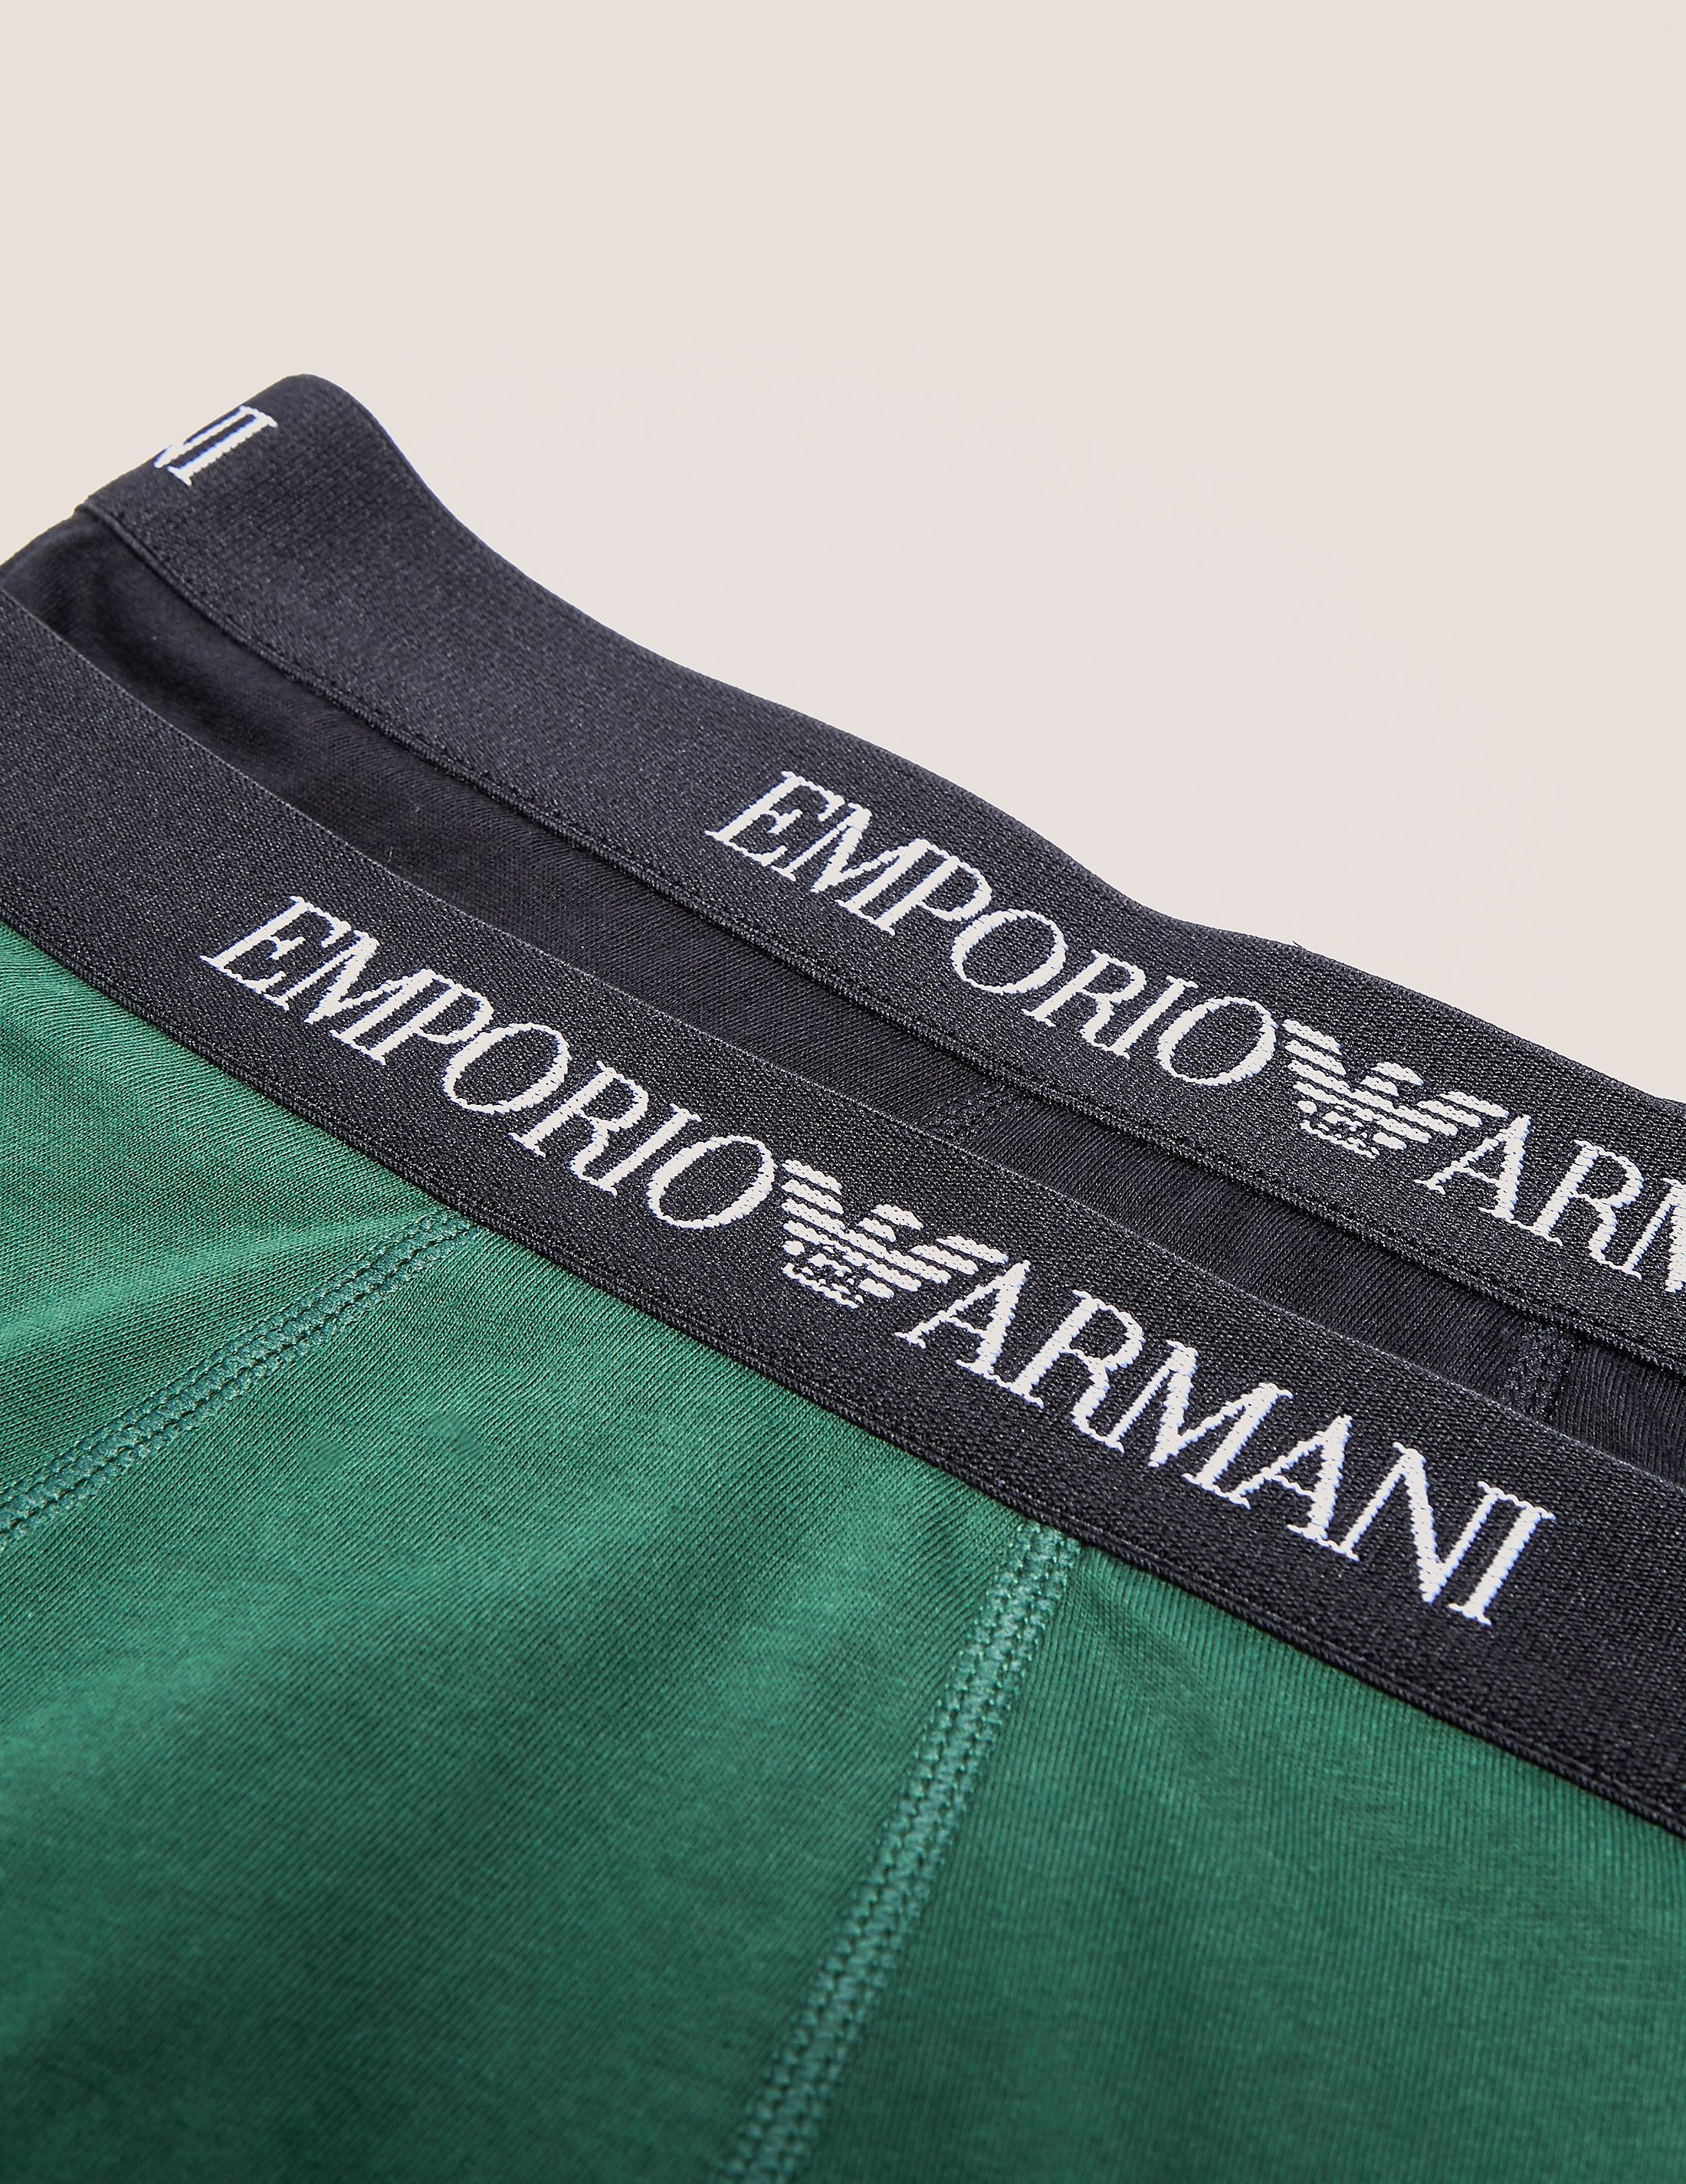 Emporio Armani 2 Pack Trunks